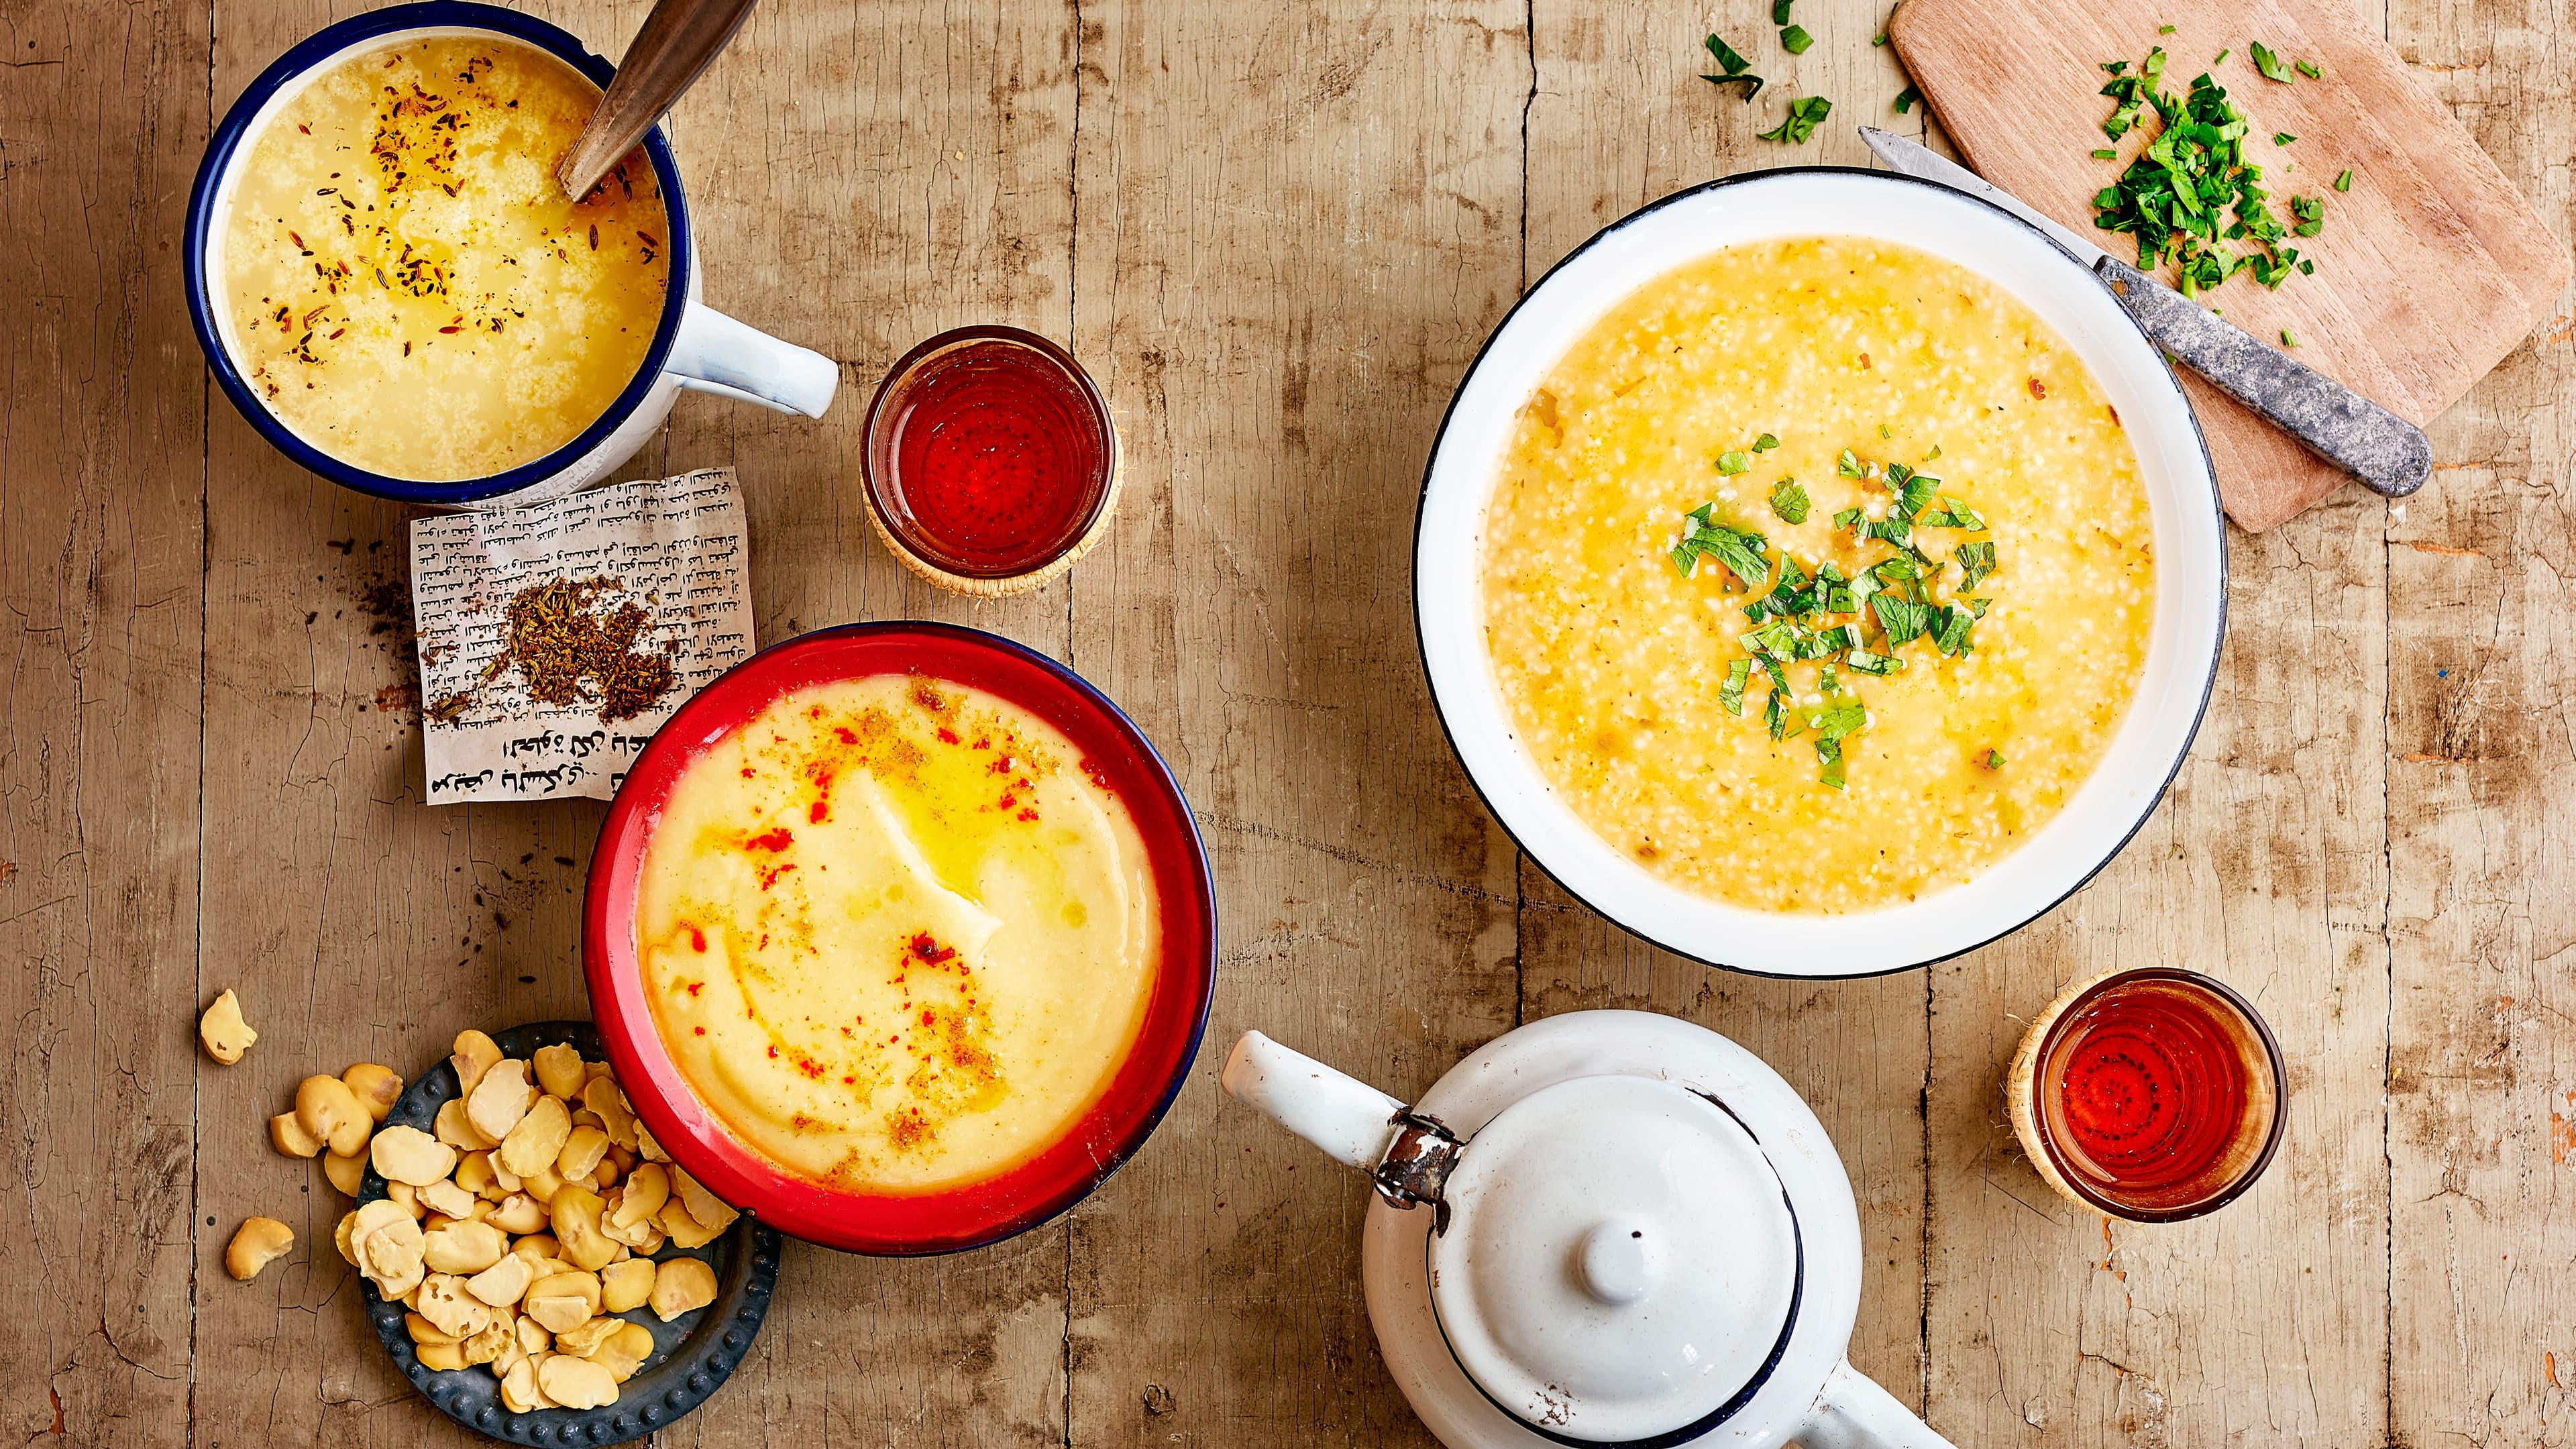 Ayurveda-Rezepte: Essen im Einklang   EDEKA